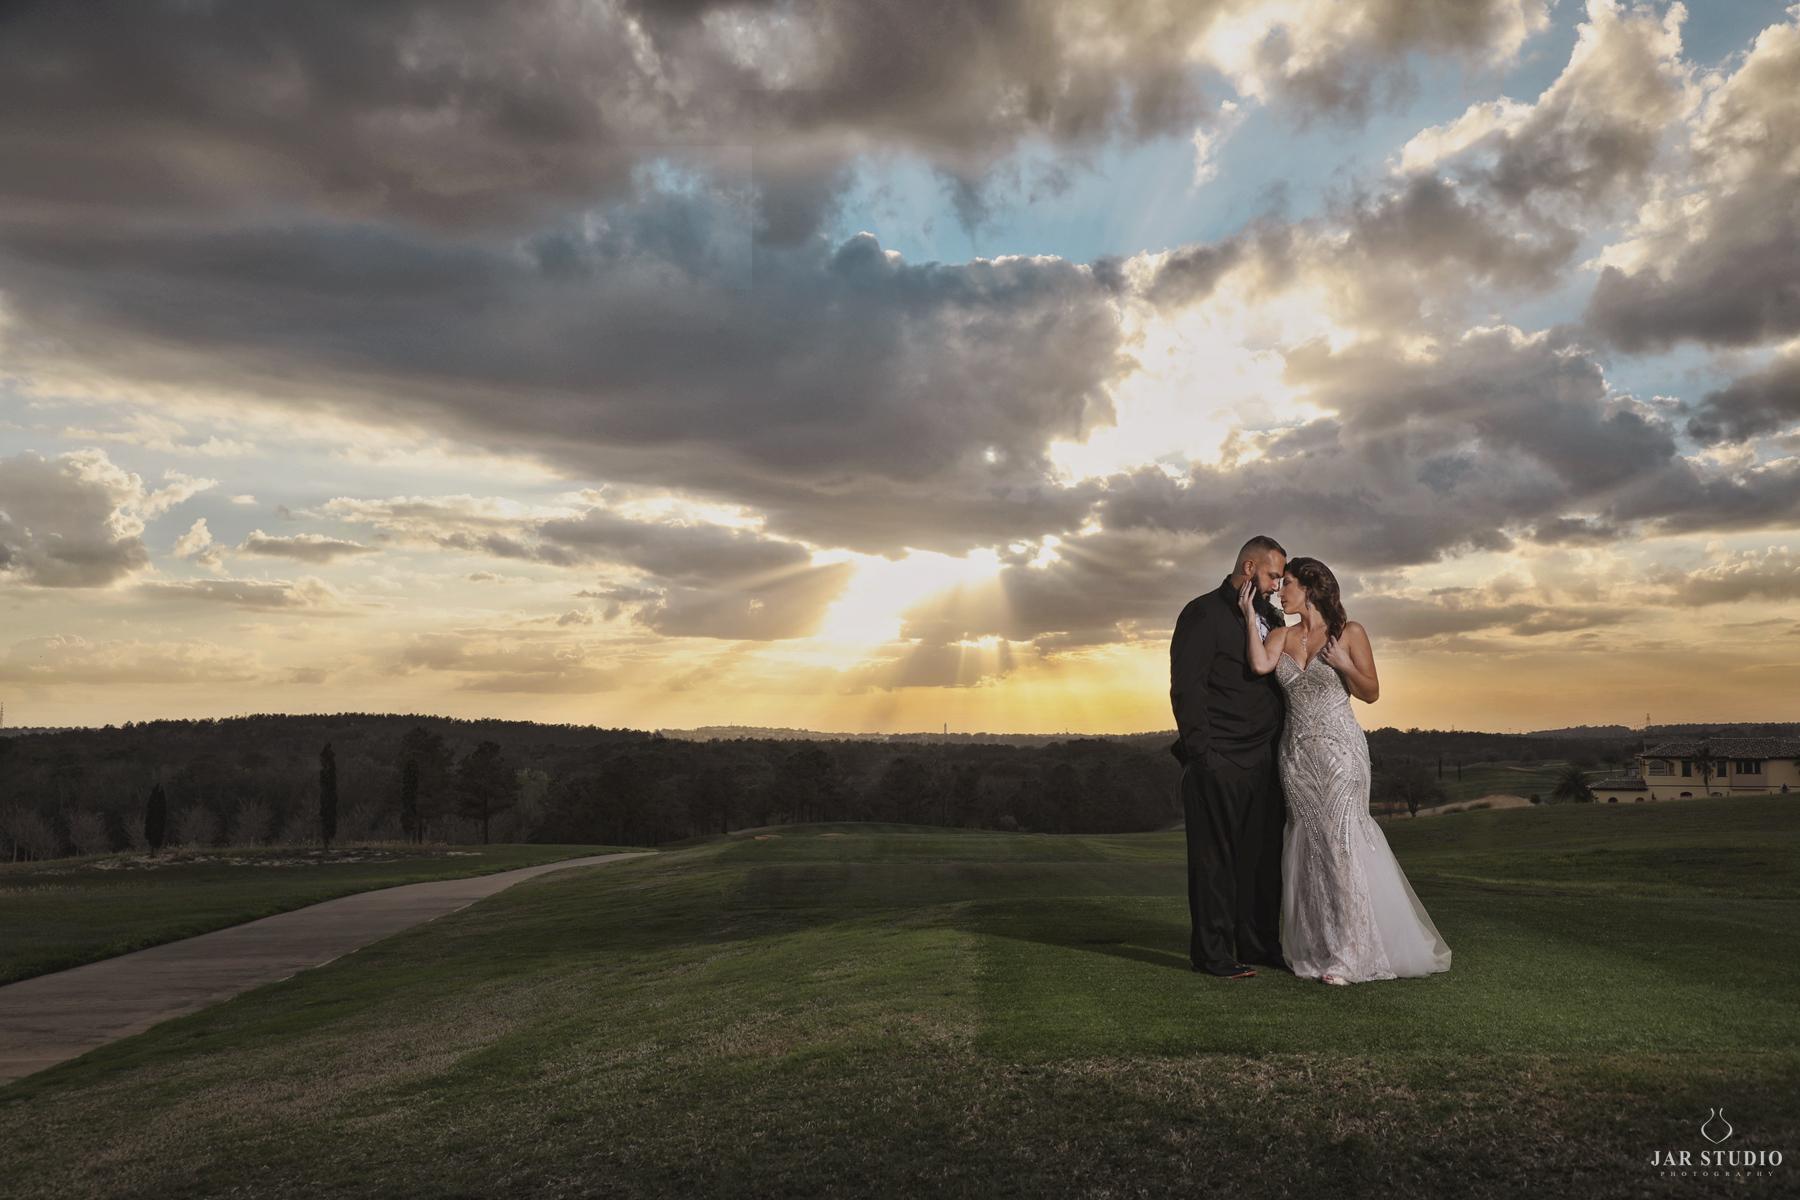 18-orlando-fl-unique-wedding-photographer-jarstudio.jpg